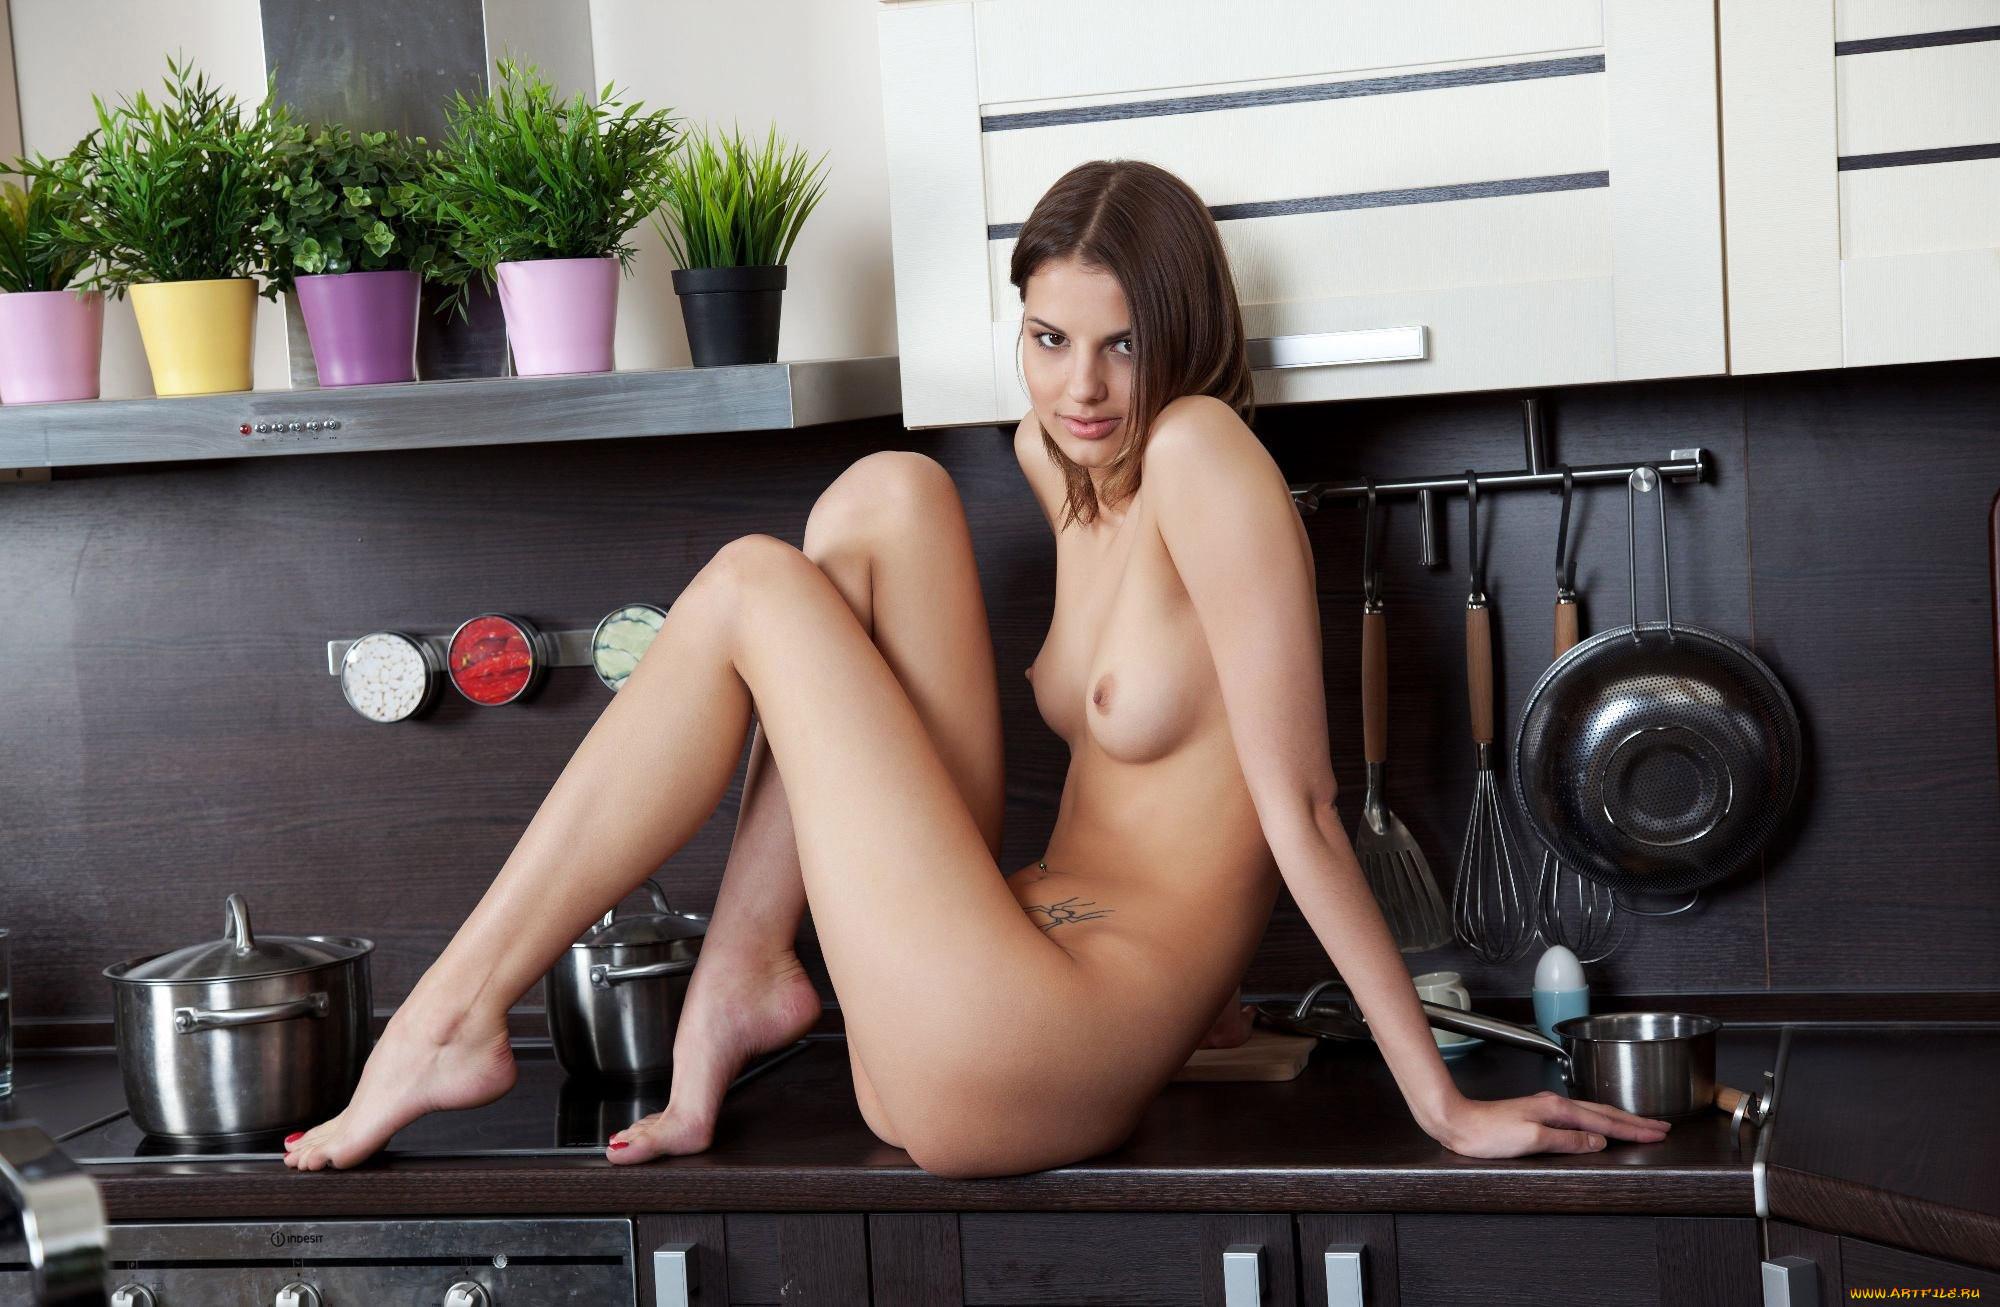 Обнаженные Кухня Фото